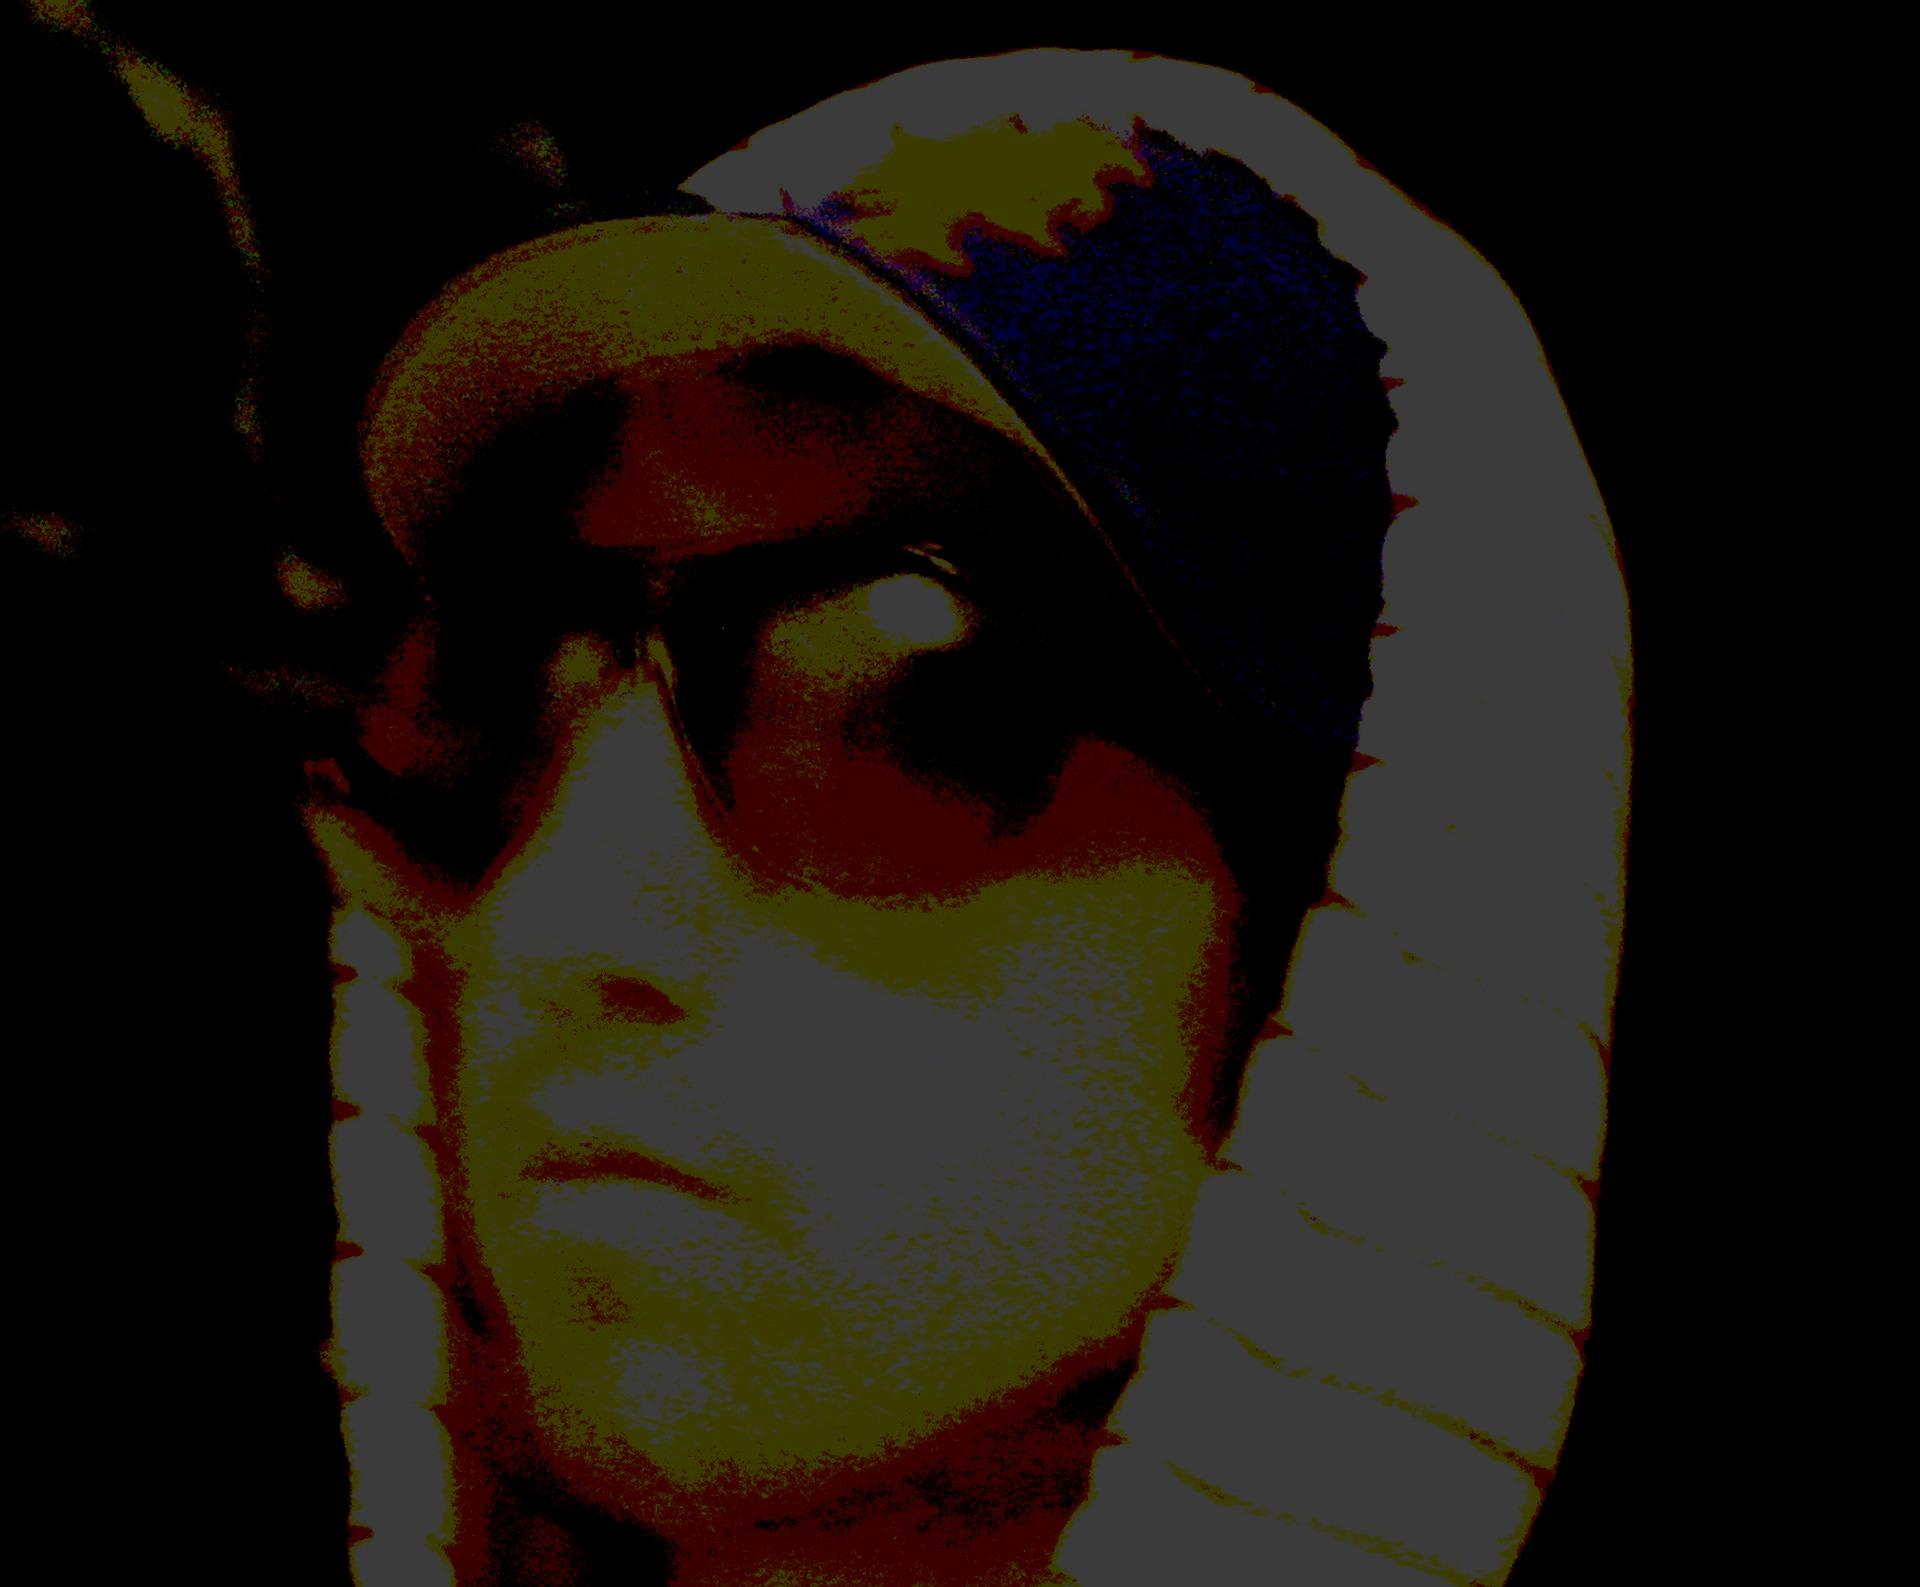 Sexual Episode in Paris (Dr. Dre ft. Snoop Dogg vs. Cassidy vs. Punjabi MC vs. Jim Jones) – By Audionugs